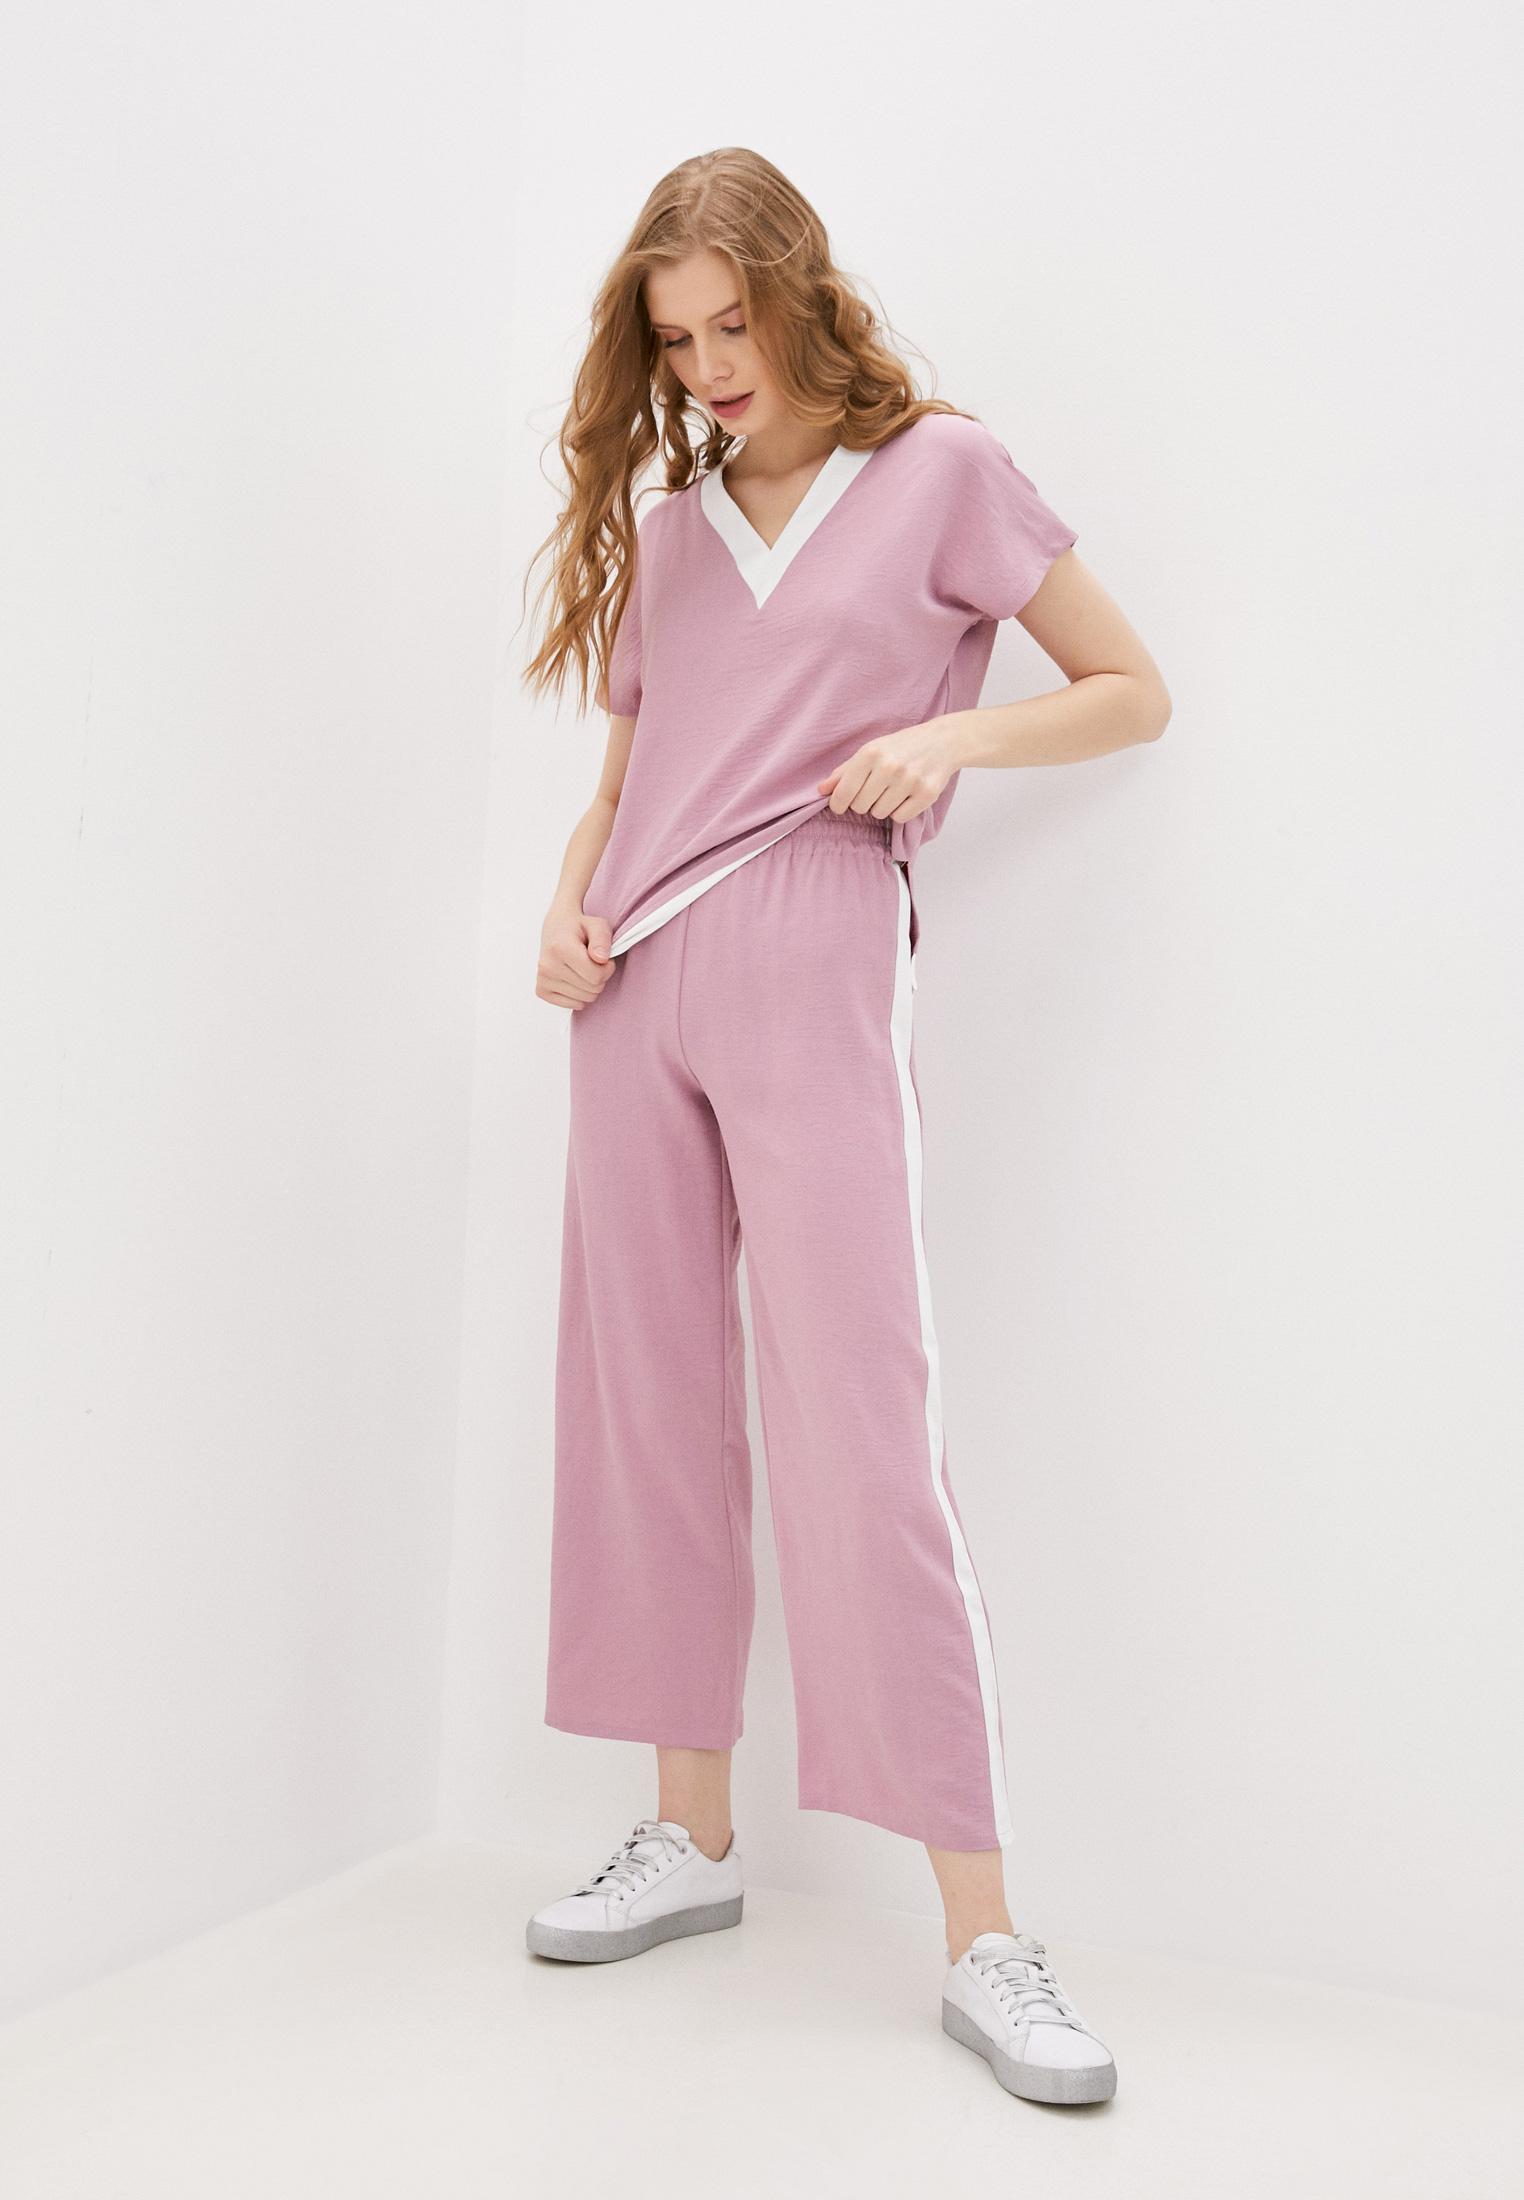 Костюм с брюками Pink Frost PFS-13-R